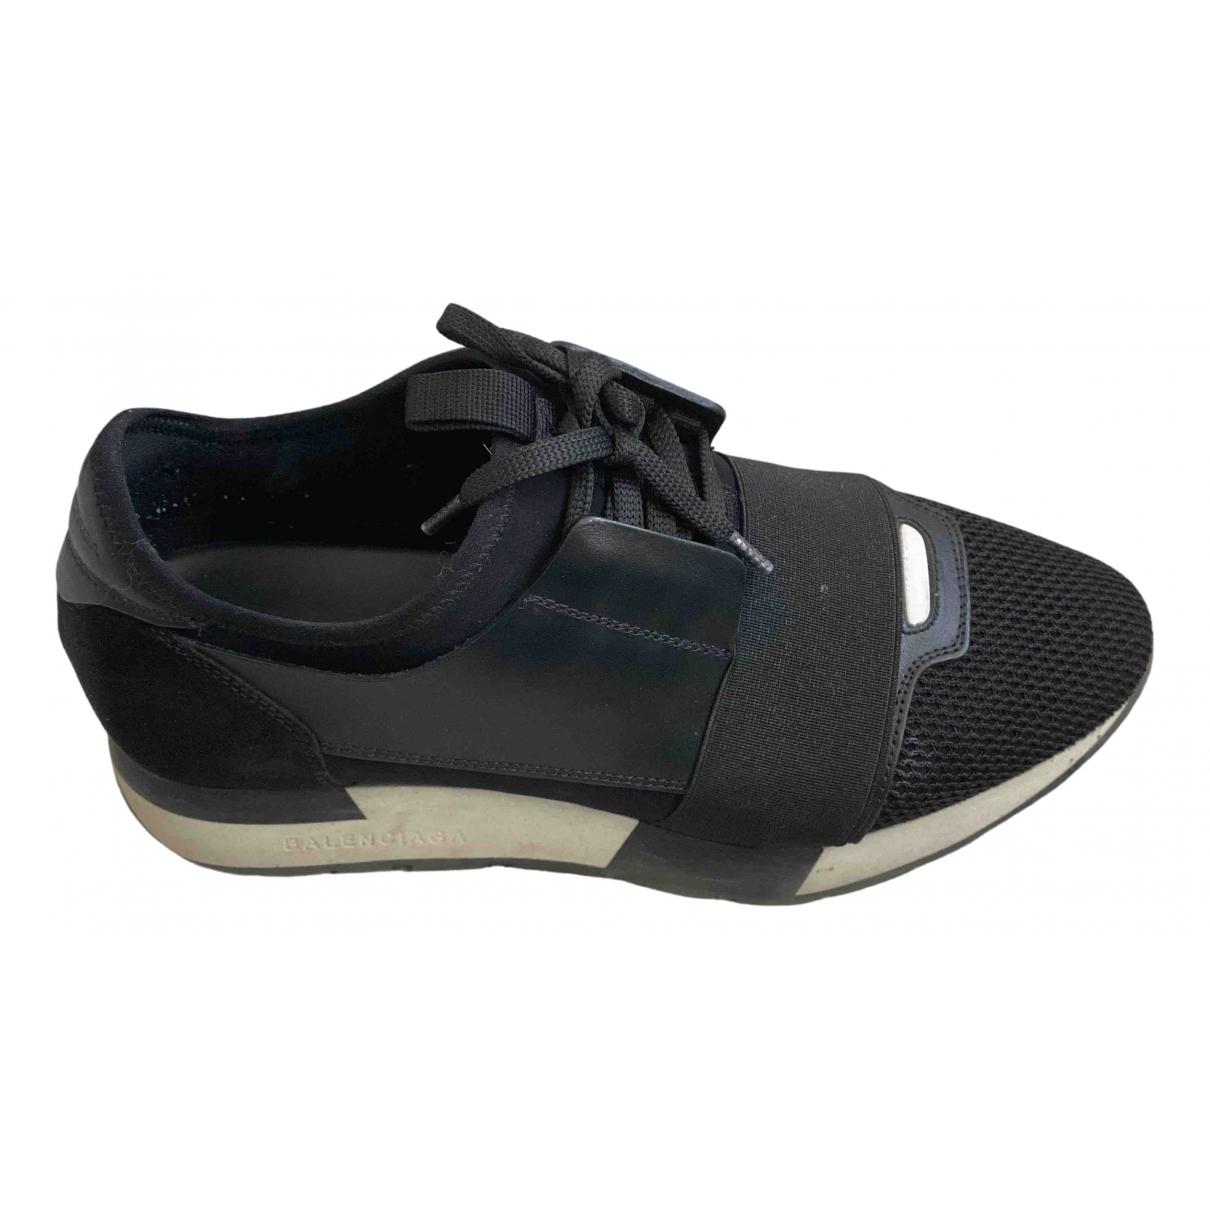 Balenciaga Race Black Leather Trainers for Women 36 EU